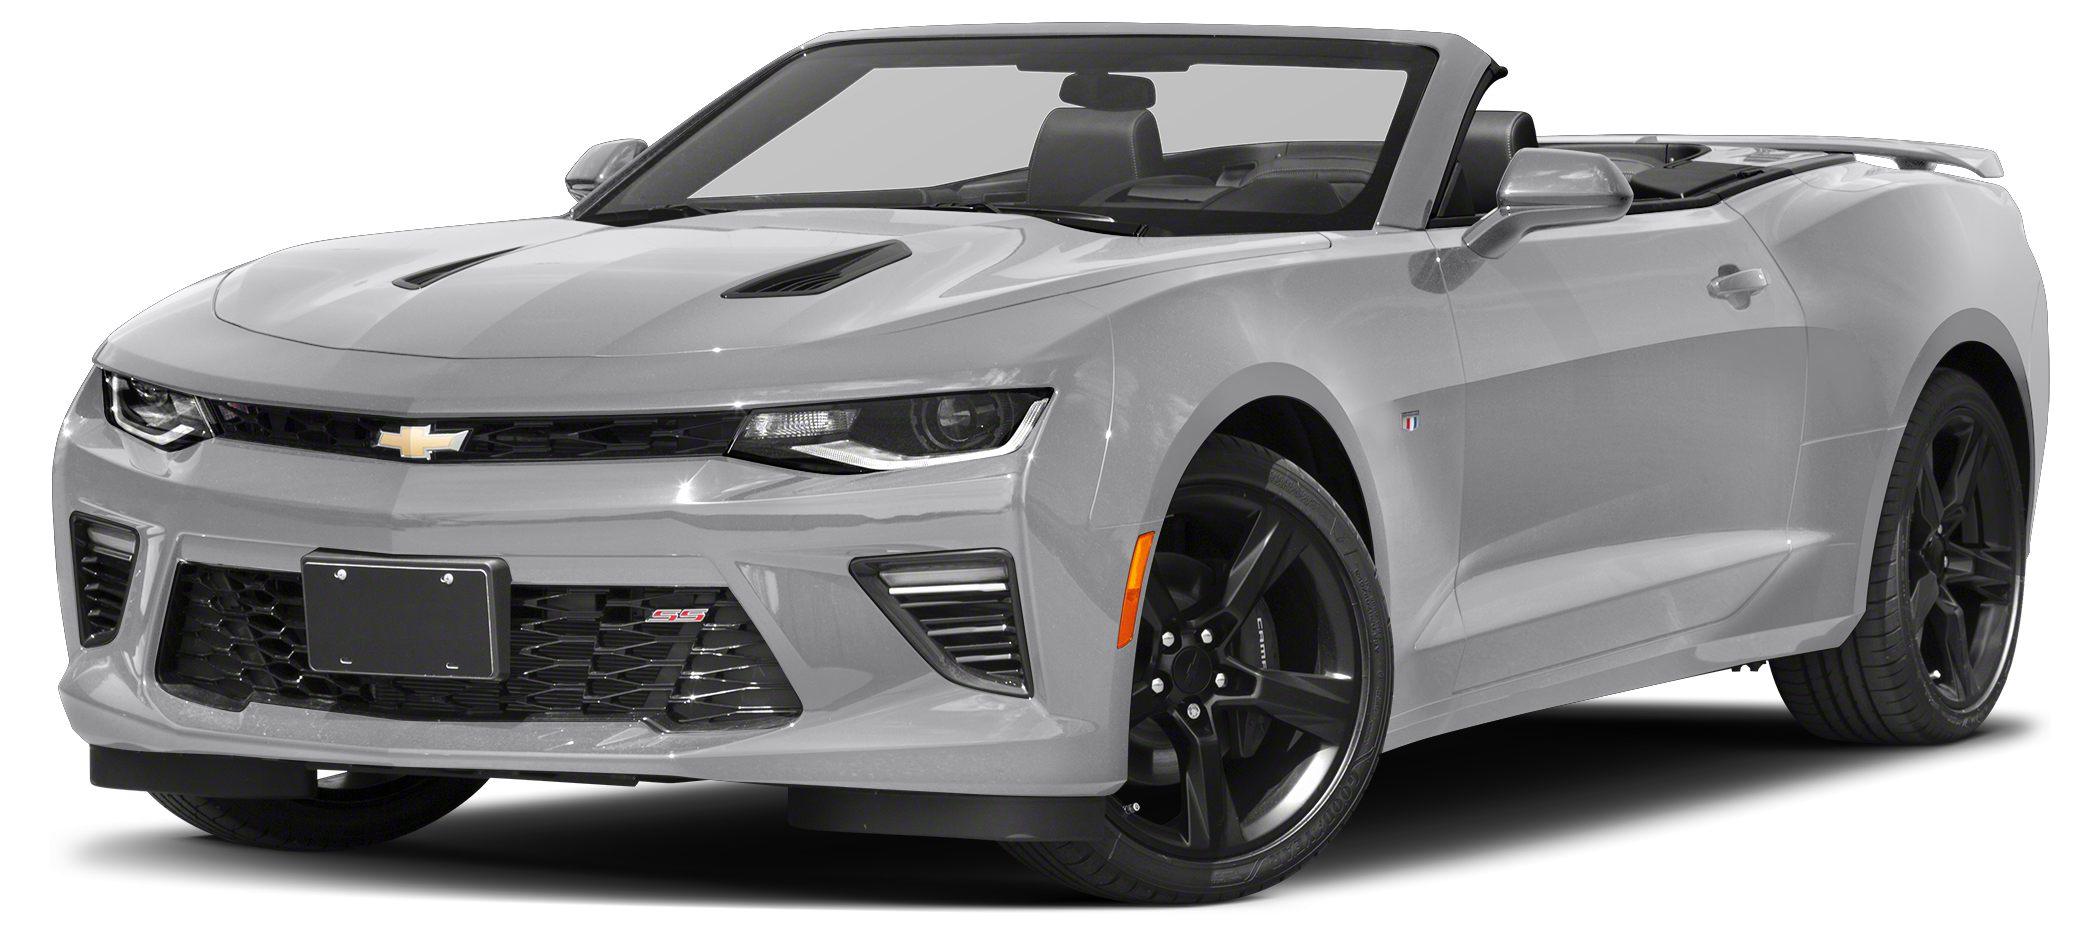 2018 Chevrolet Camaro SS w2SS HeatedCooled Leather Seats Nav System ENGINE 62L 376 CI V8 D